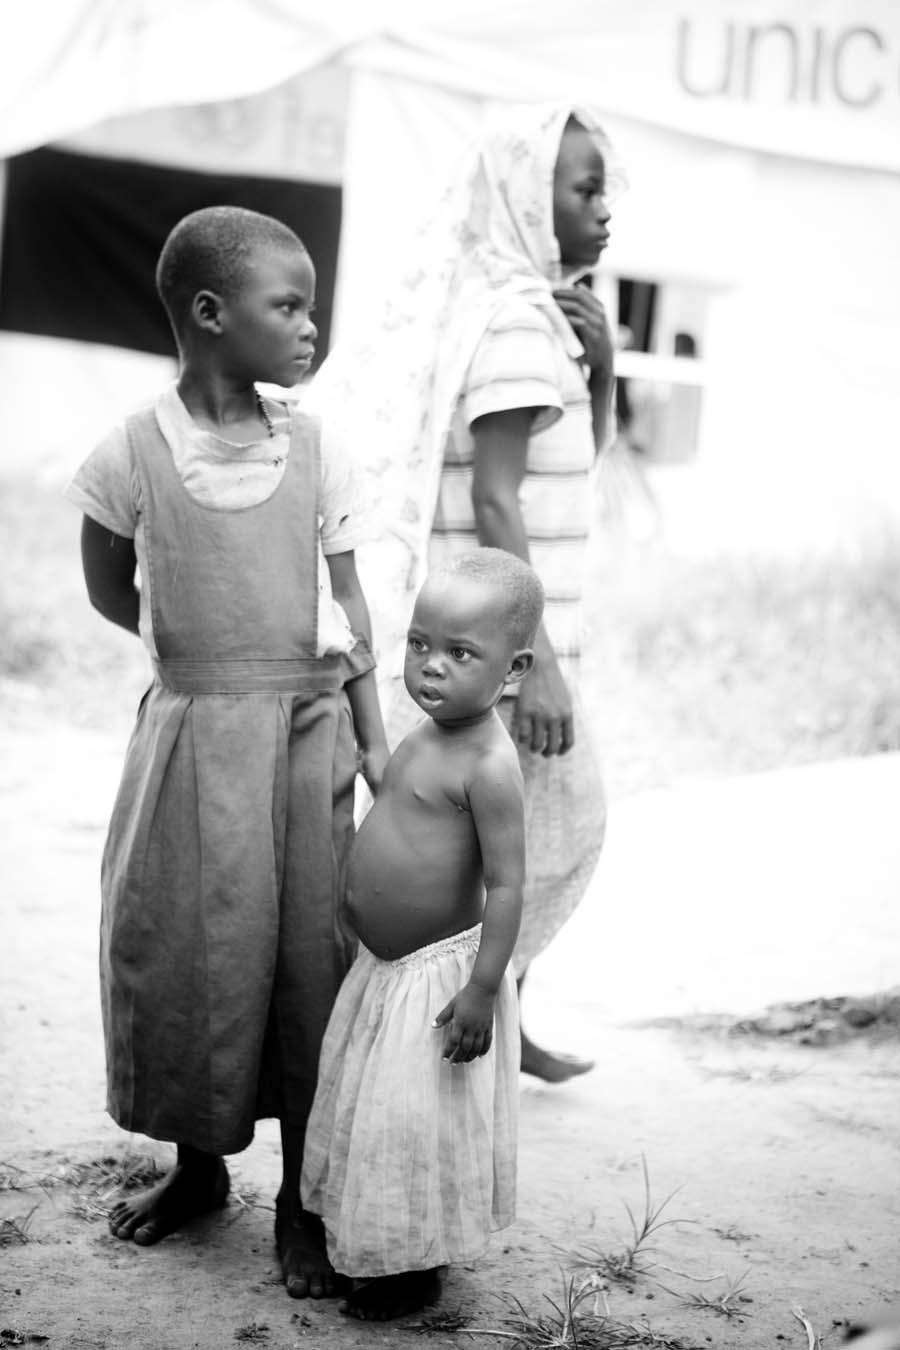 jessicadavisphotography.com | Jessica Davis Photography | Portrait Work in Uganda| Travel Photographer | World Event Photographs 3 (1).jpg